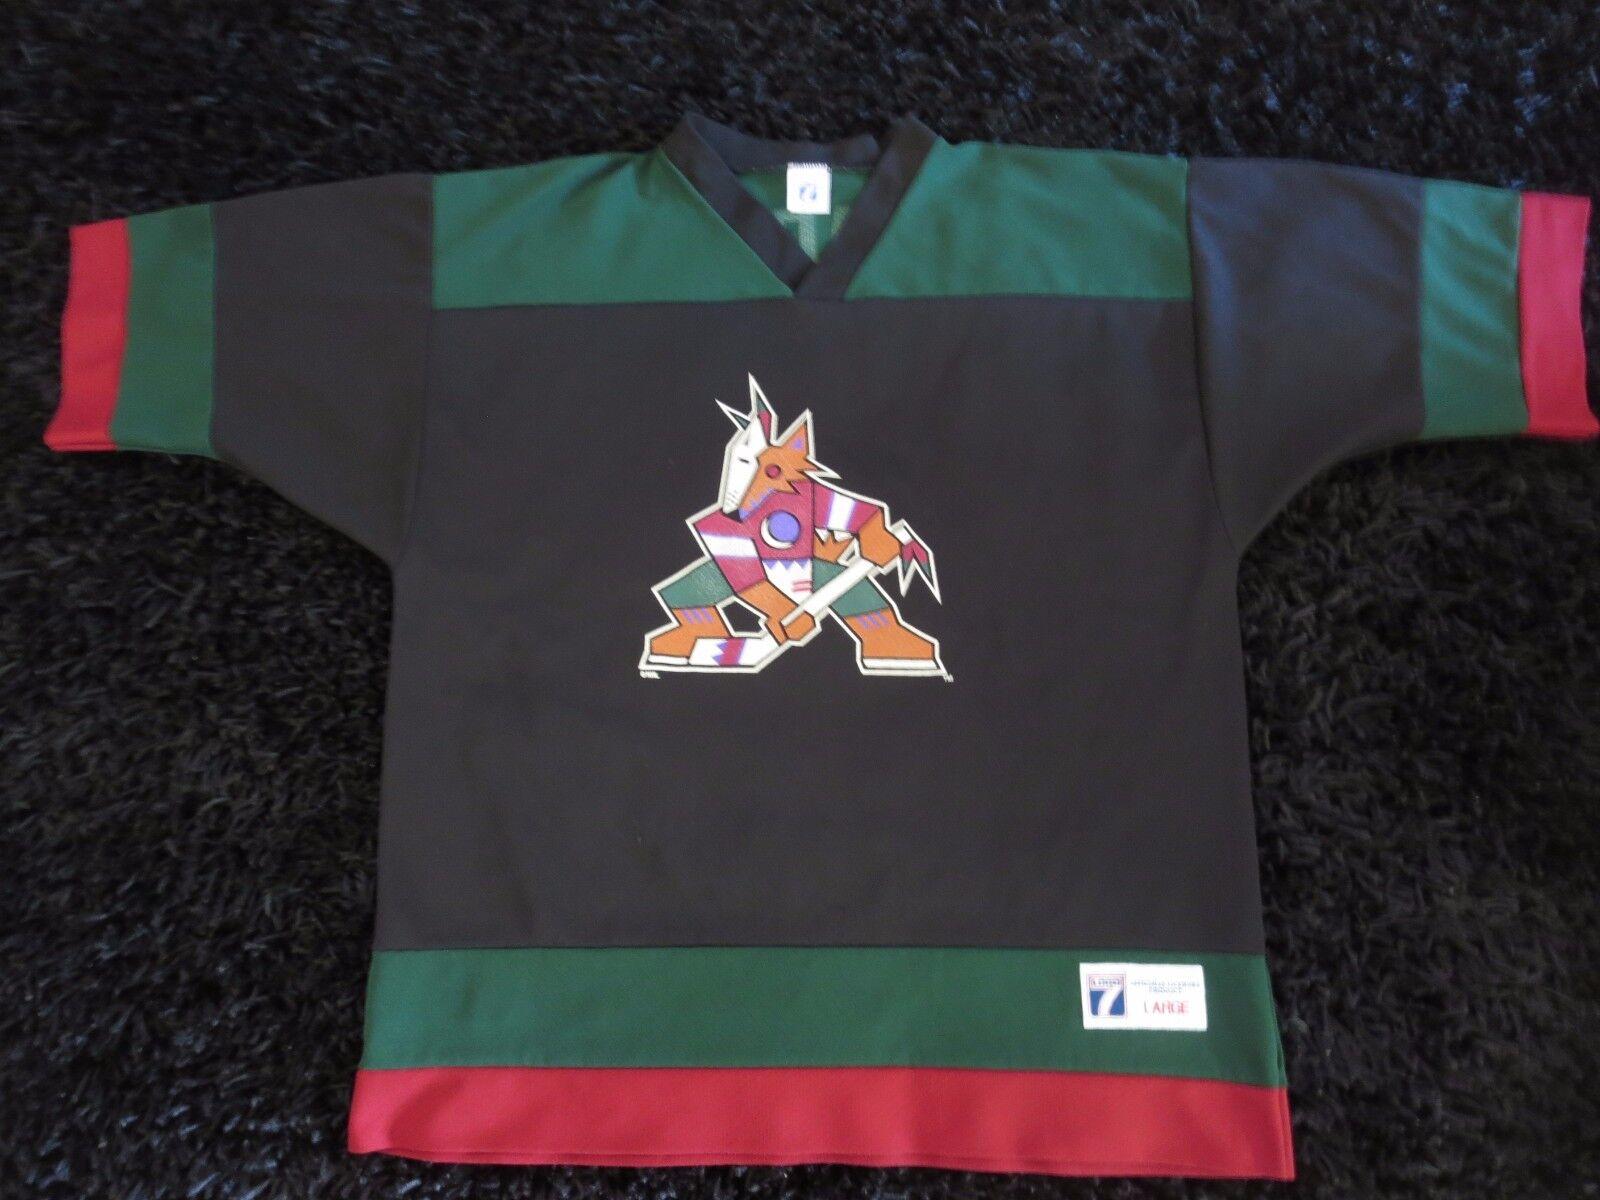 Keith Phoenix Coyotes NHL Camiseta Lg Arizona Tkachuk nvndes2820 ... d633623b2